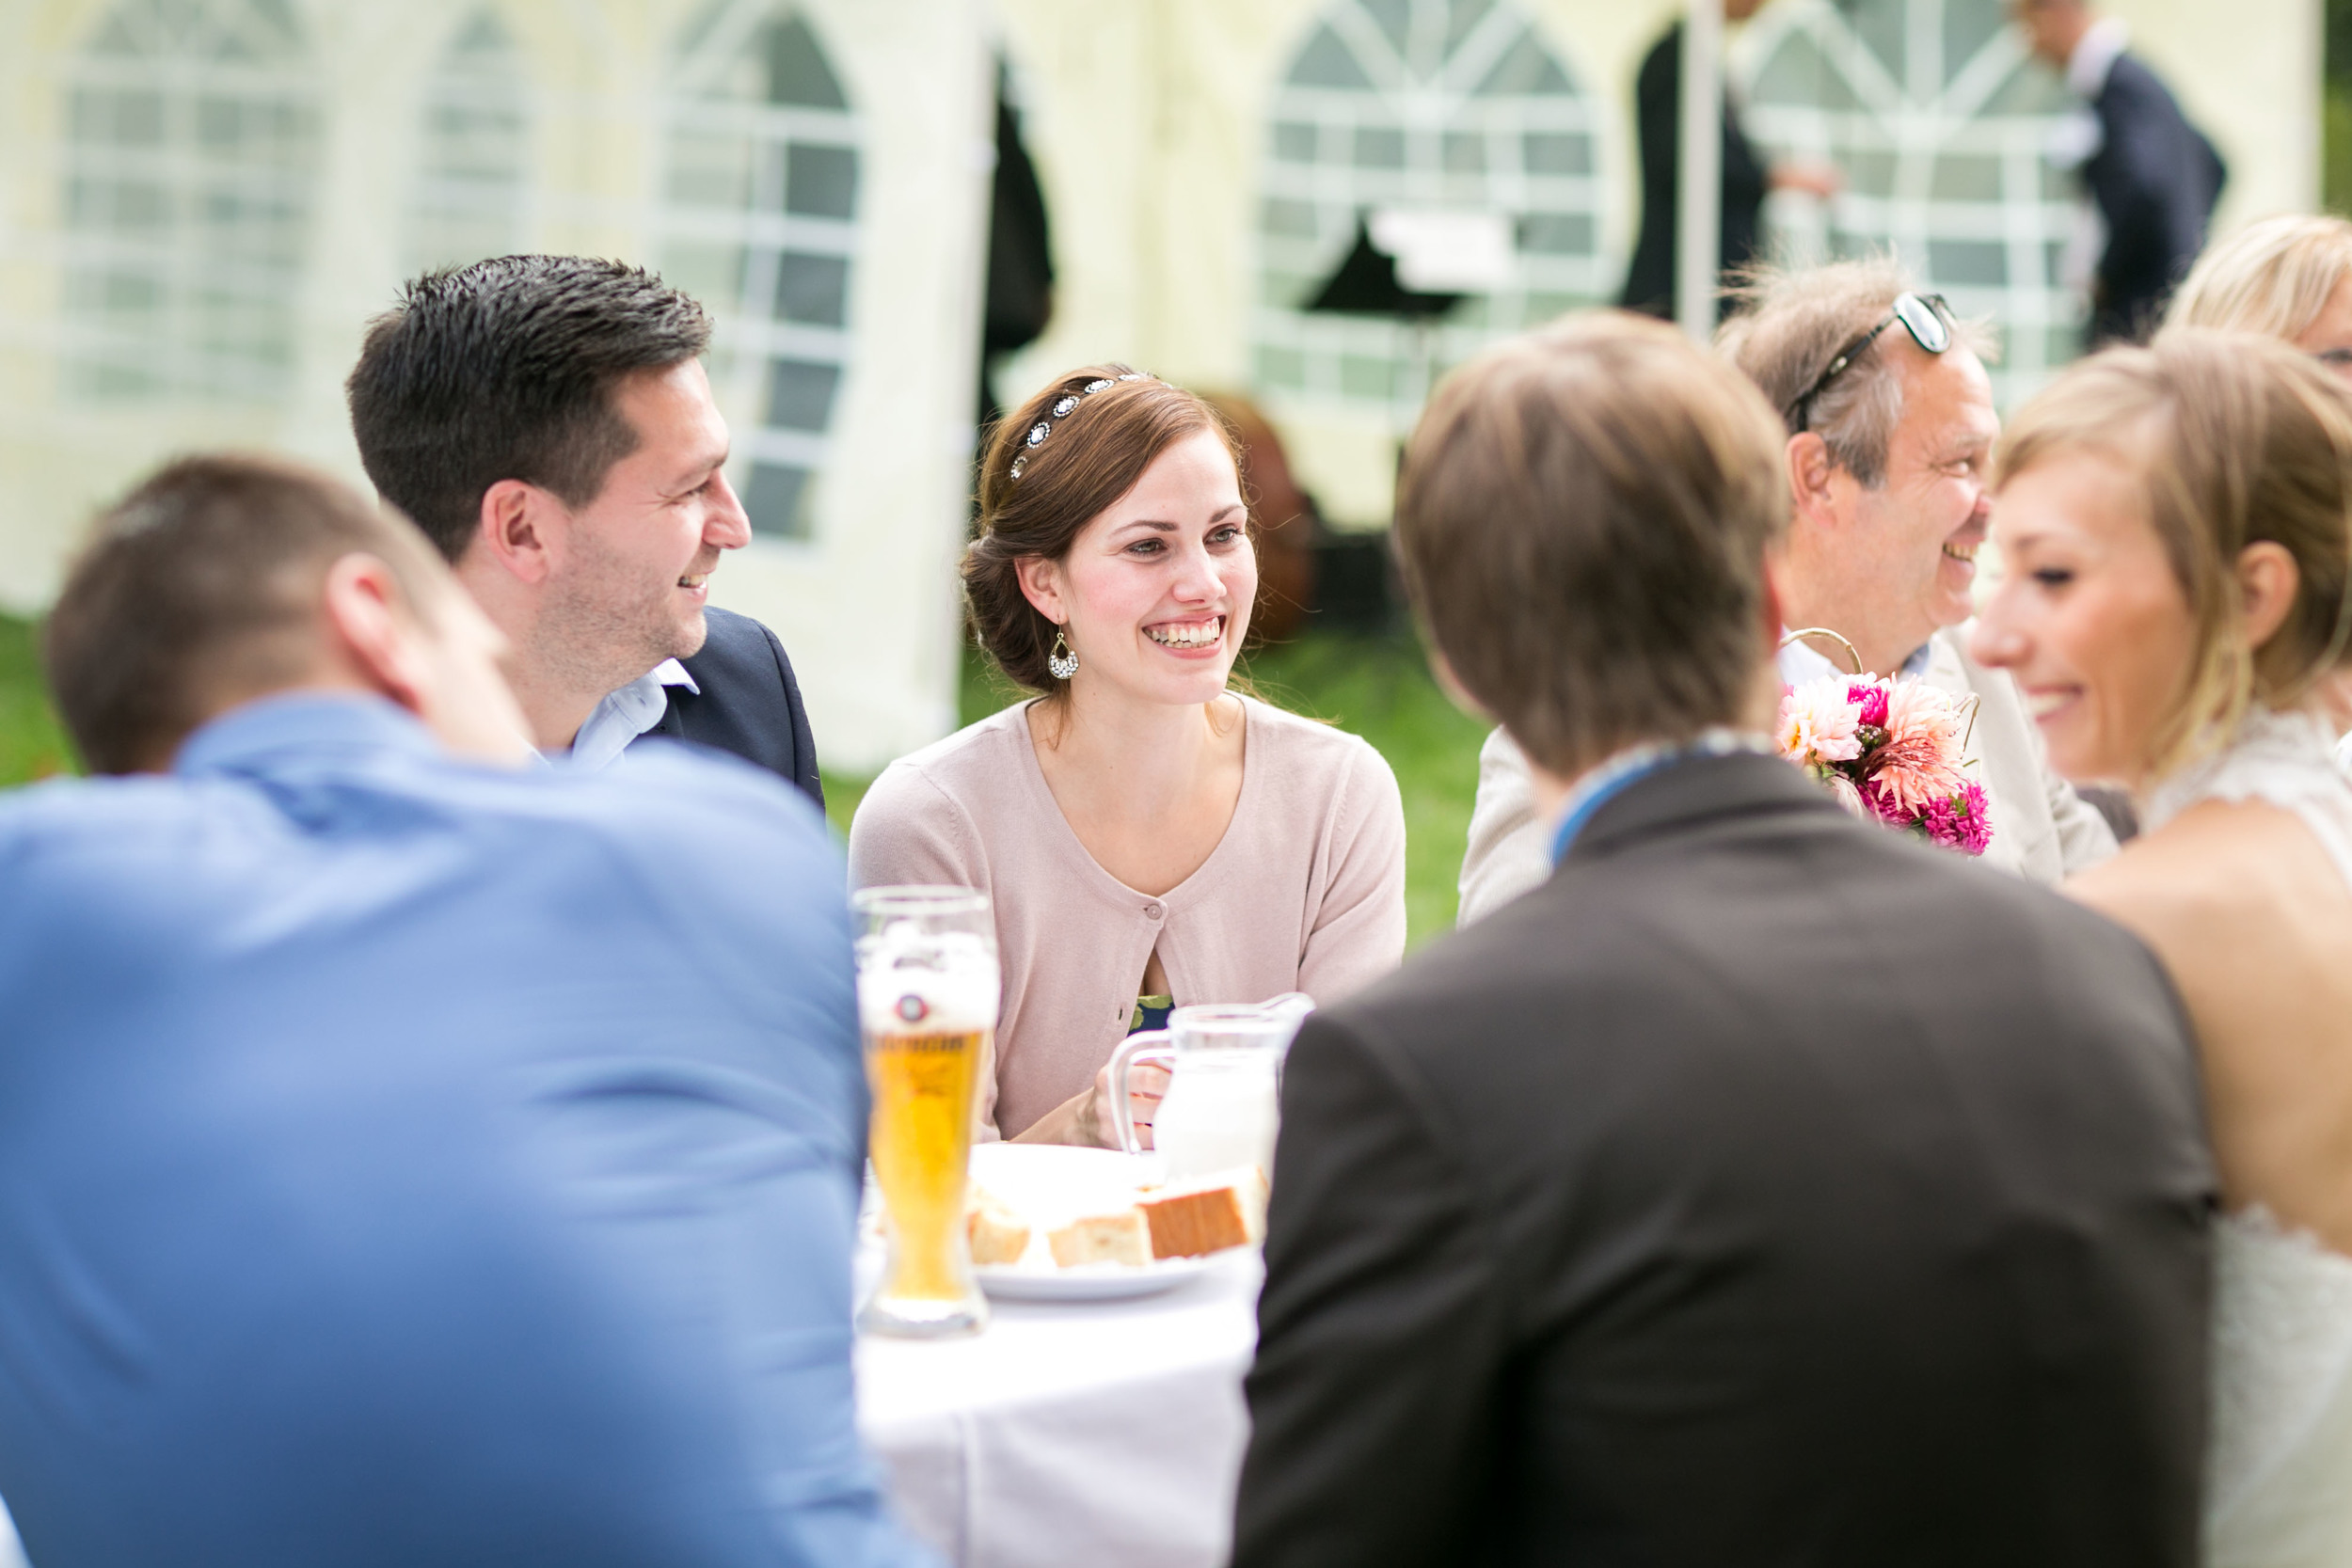 Fran Burrows Hochzeitsfotografie_Kulturgut Wrechen Hochzeit-49.jpg